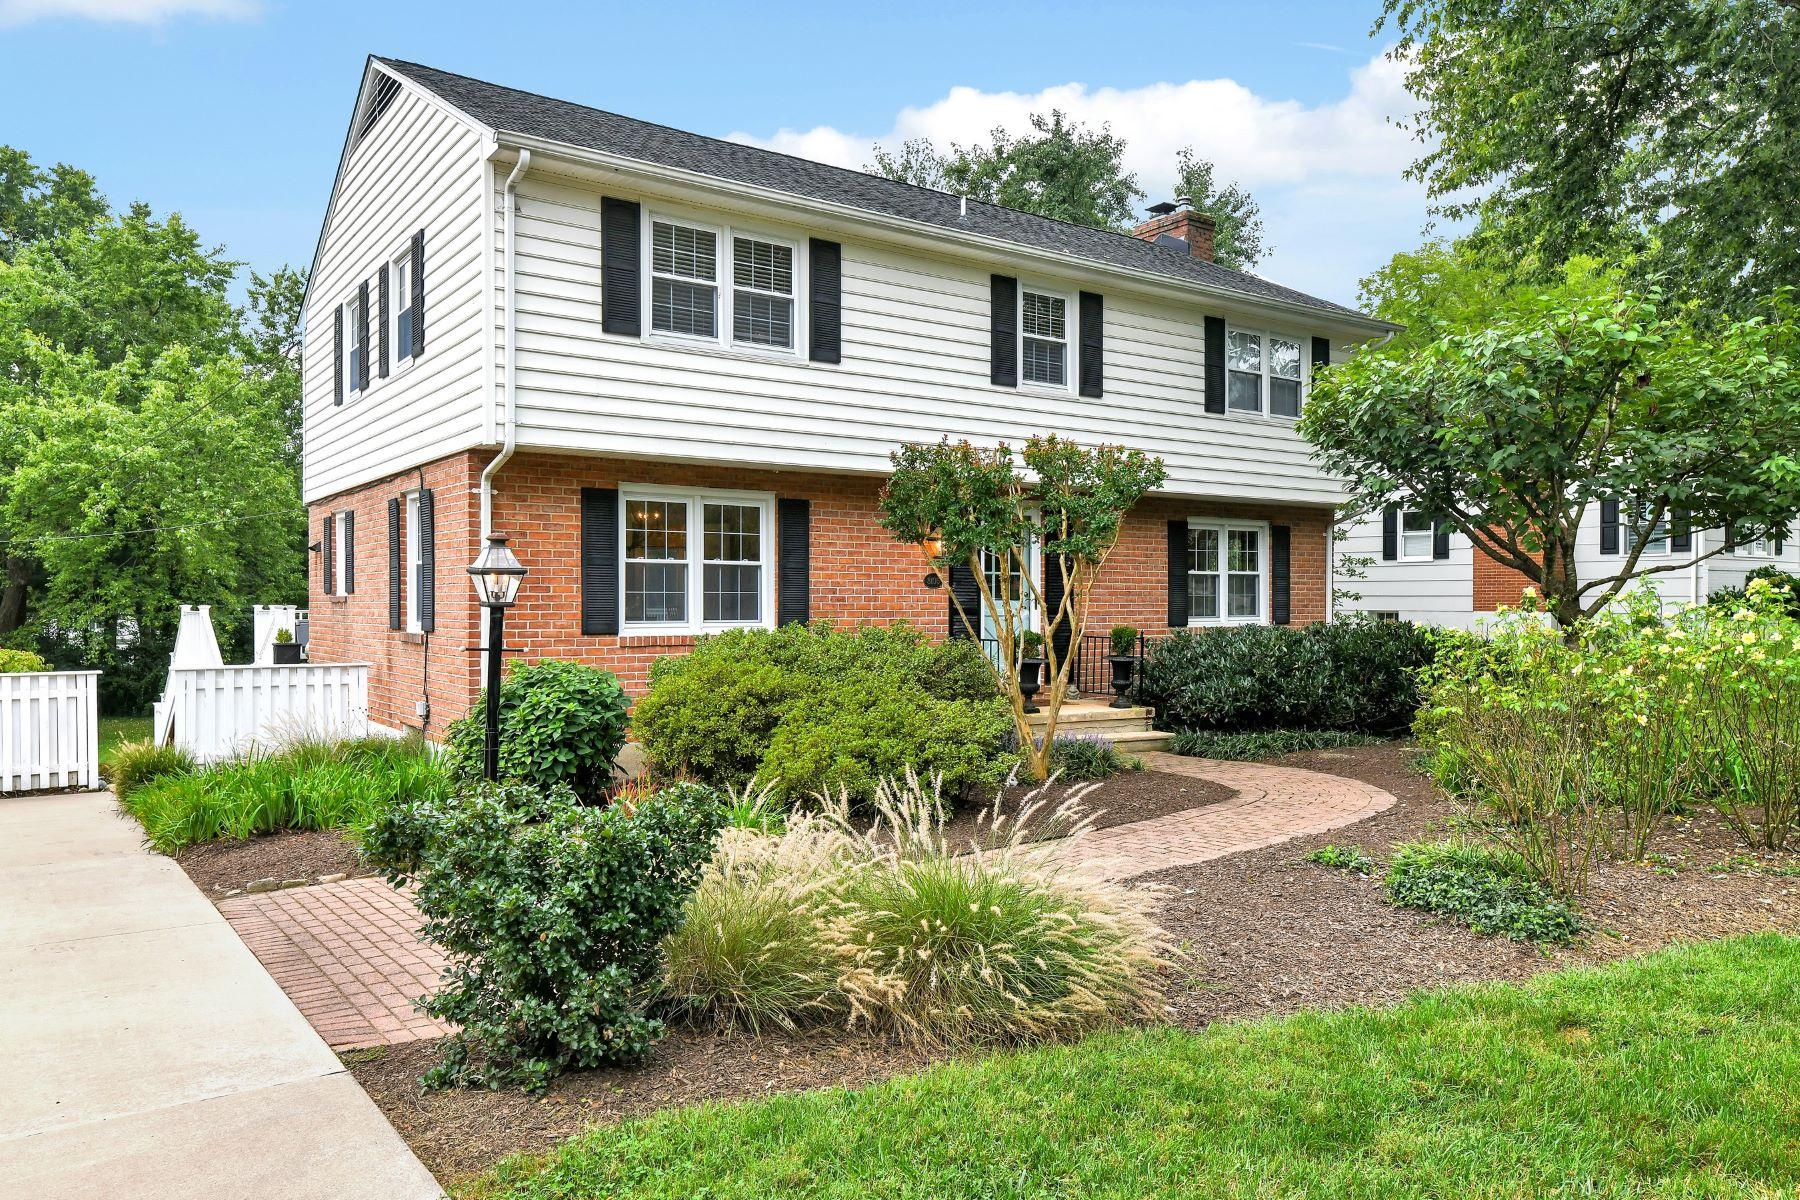 Single Family Homes por un Venta en Impeccable Village Green Colonial 8105 Halton Road Towson, Maryland 21204 Estados Unidos